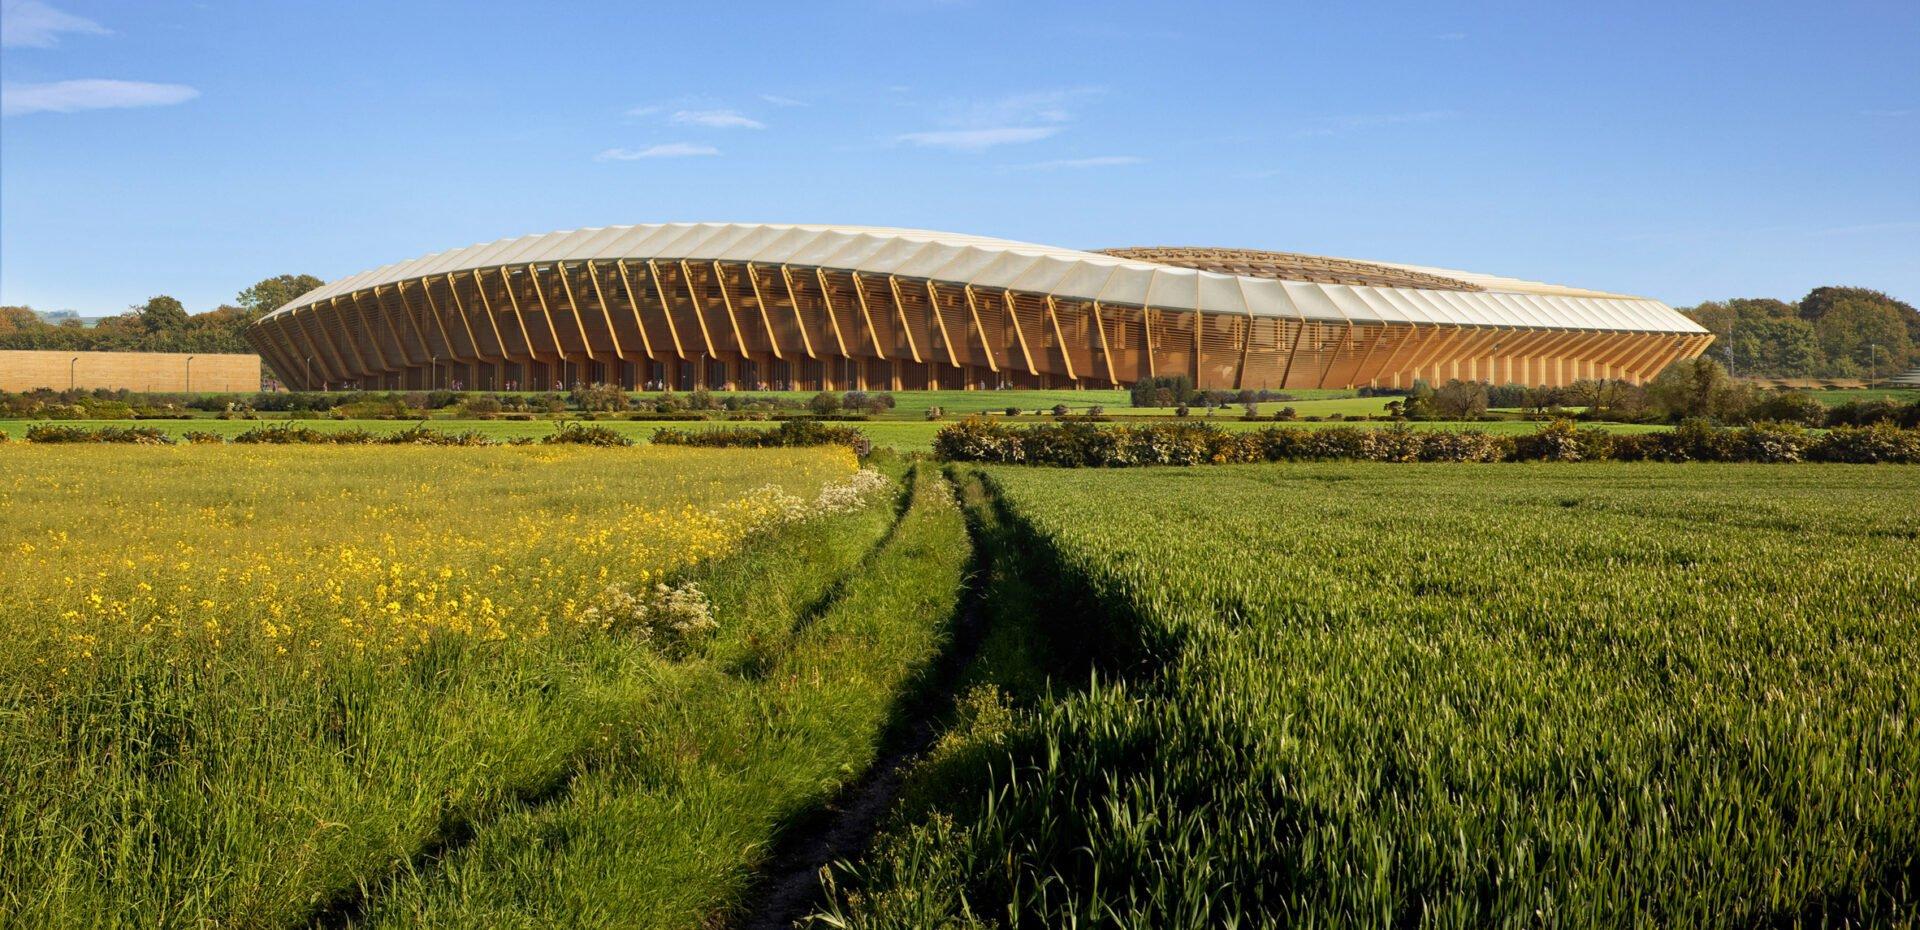 استادیوم چوبی